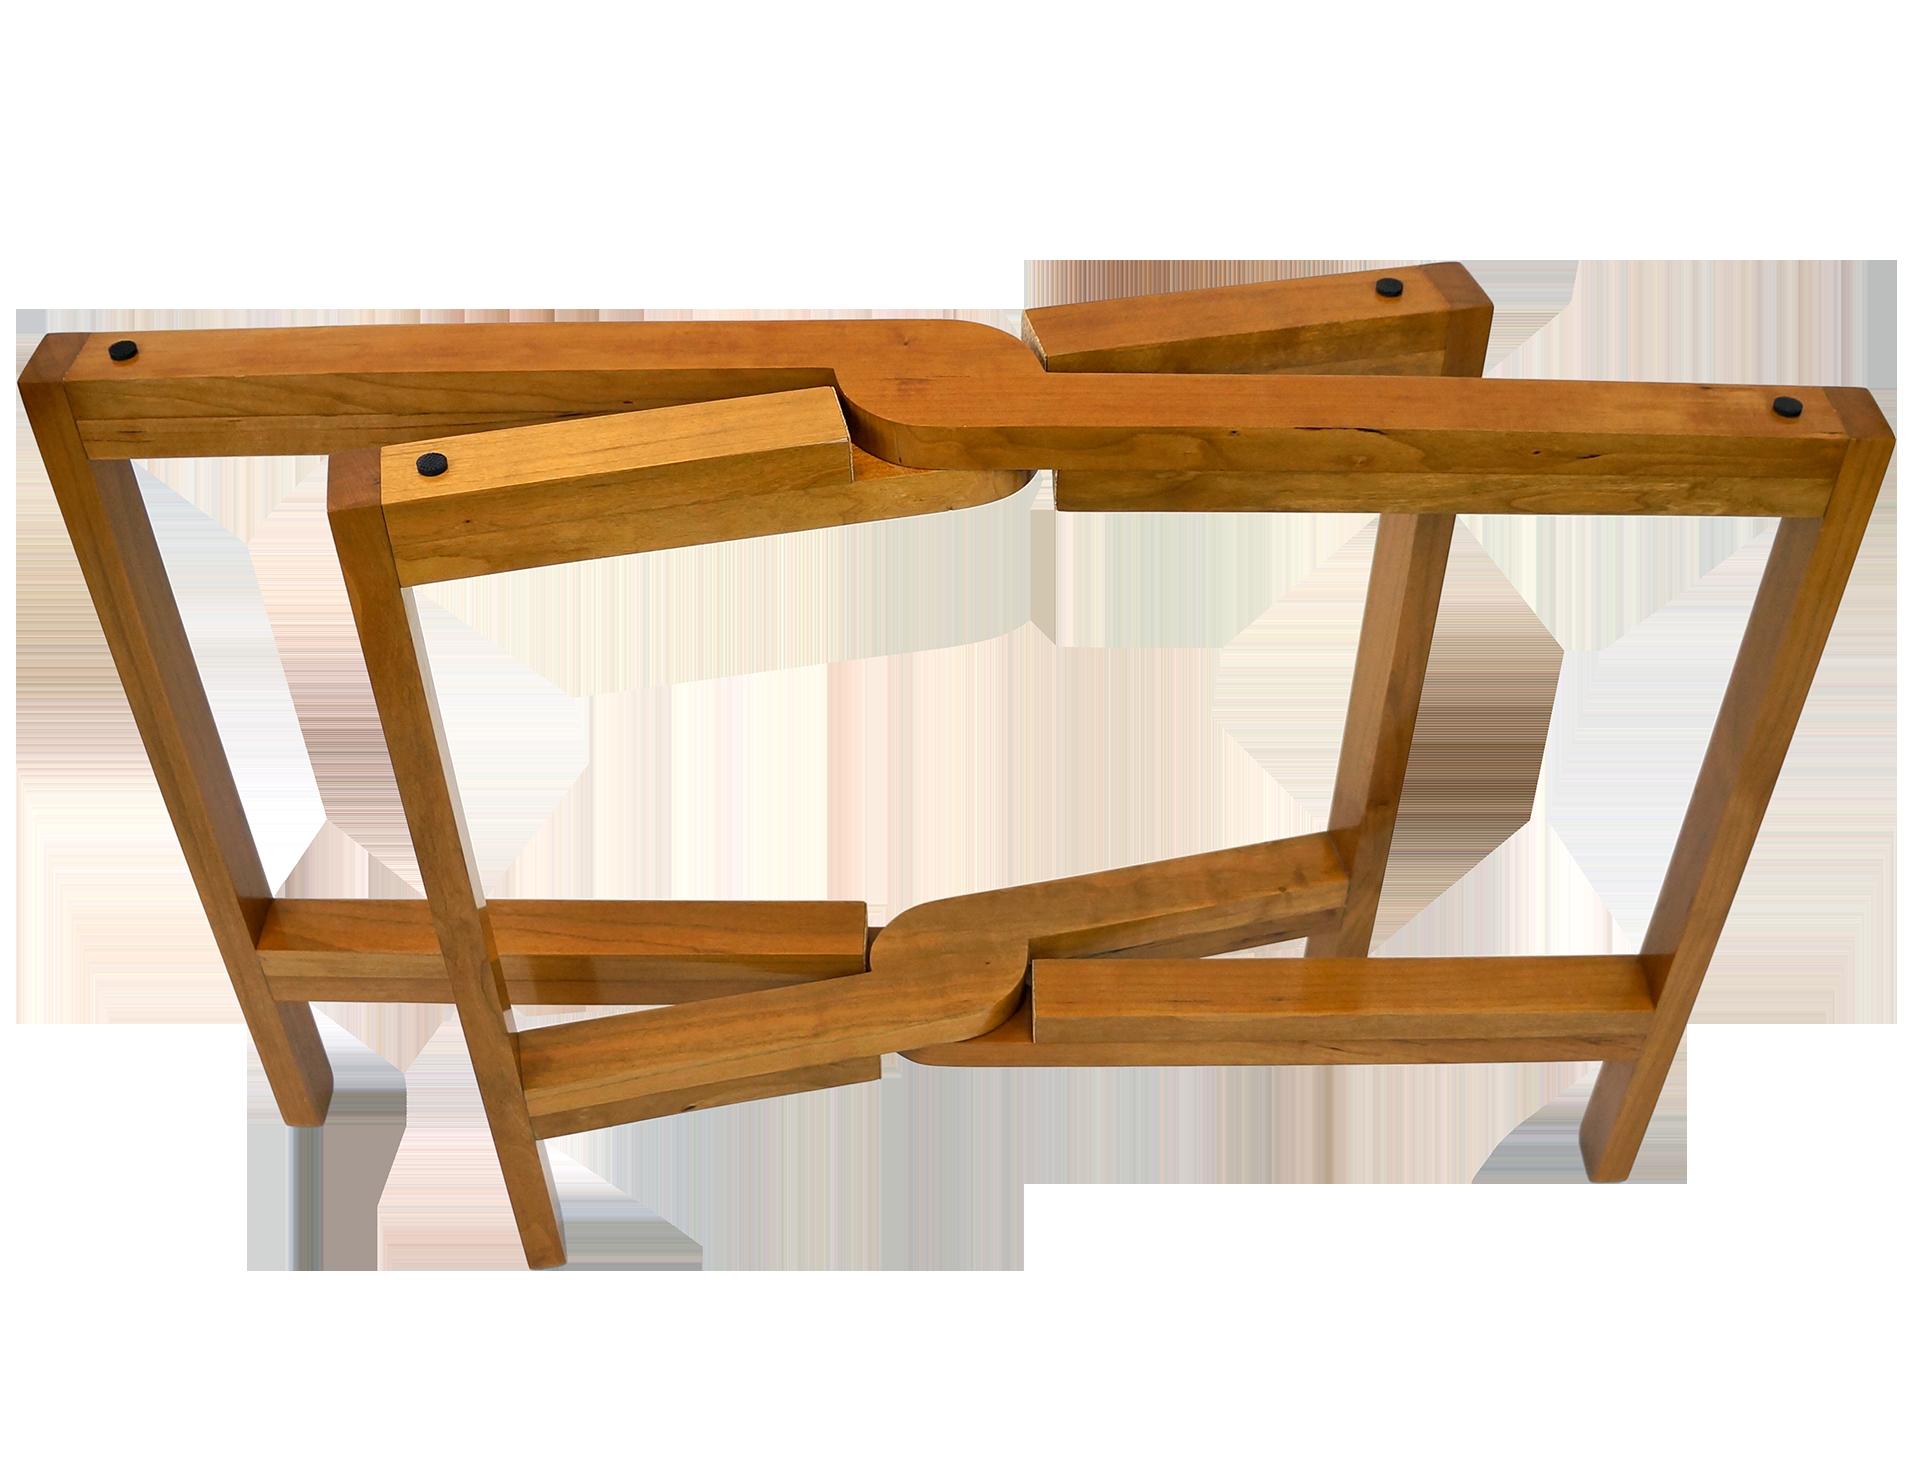 Folding table base 3.png